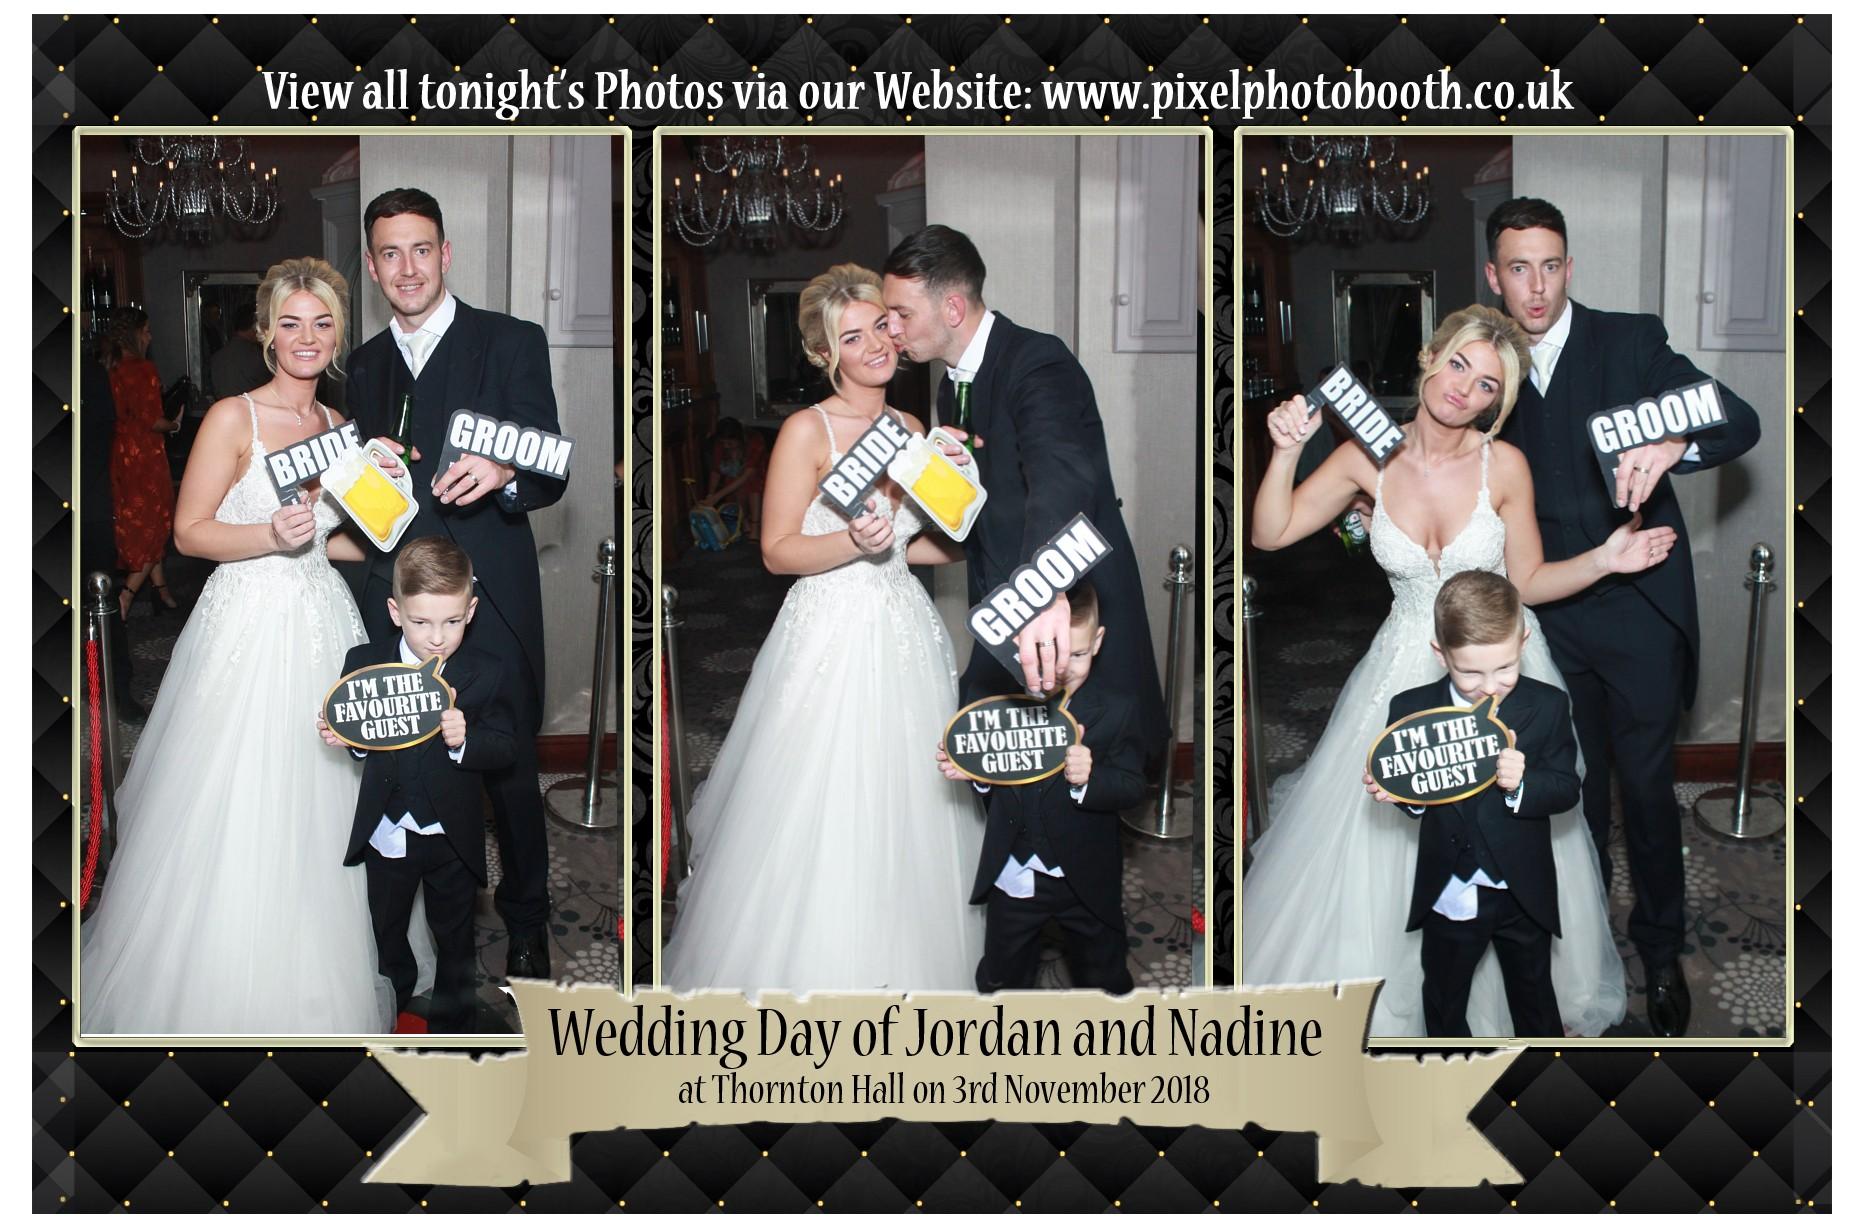 3rd Nov 2018: Jordan and Nadine's Wedding at Thornton Hall Hotel